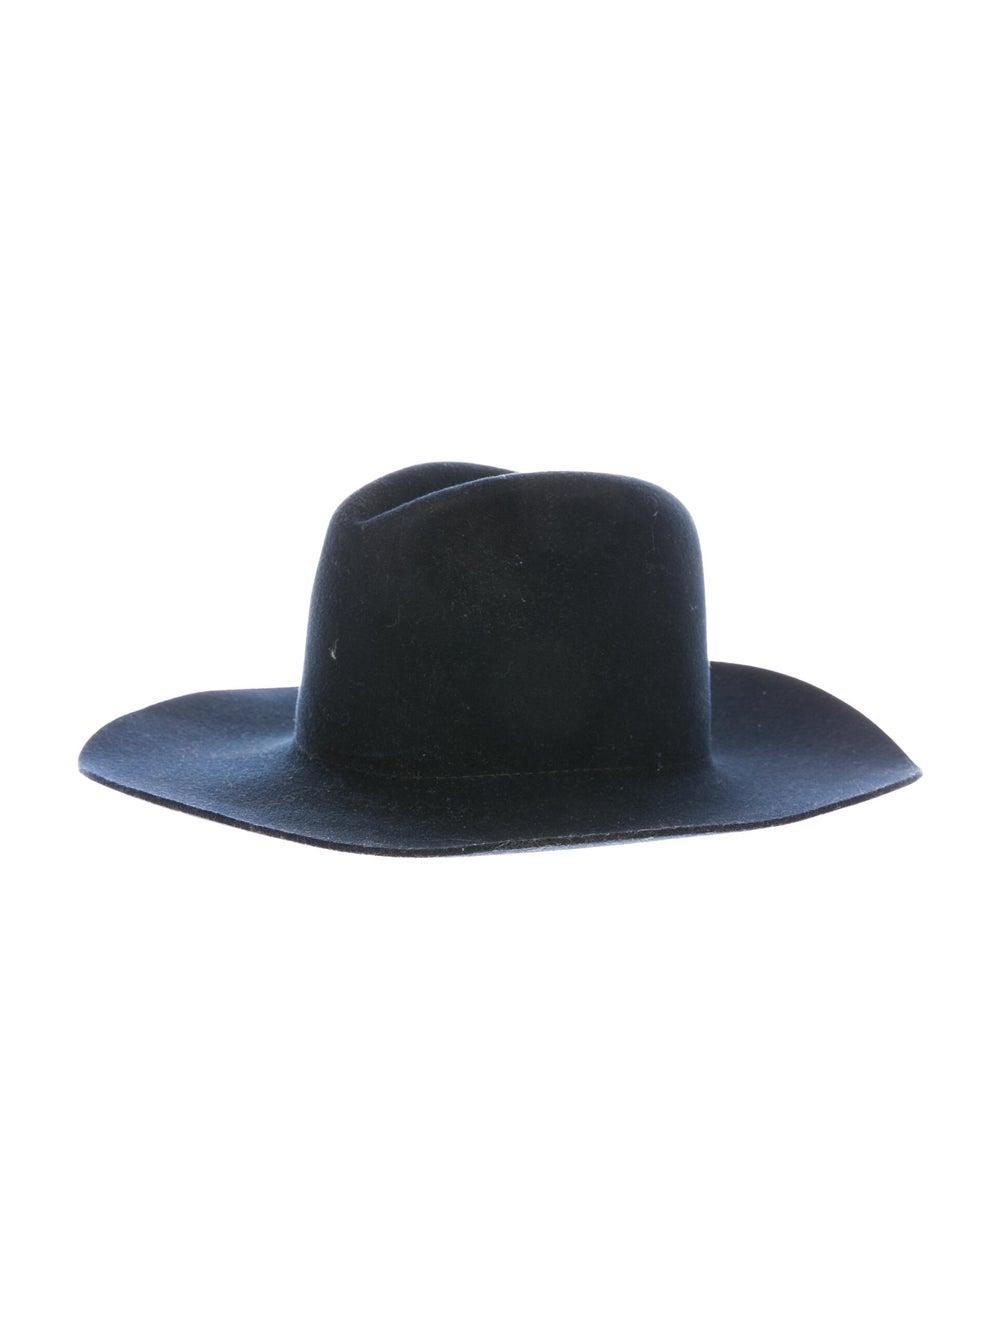 Janessa Leone Wool Fedora Hat Navy - image 1